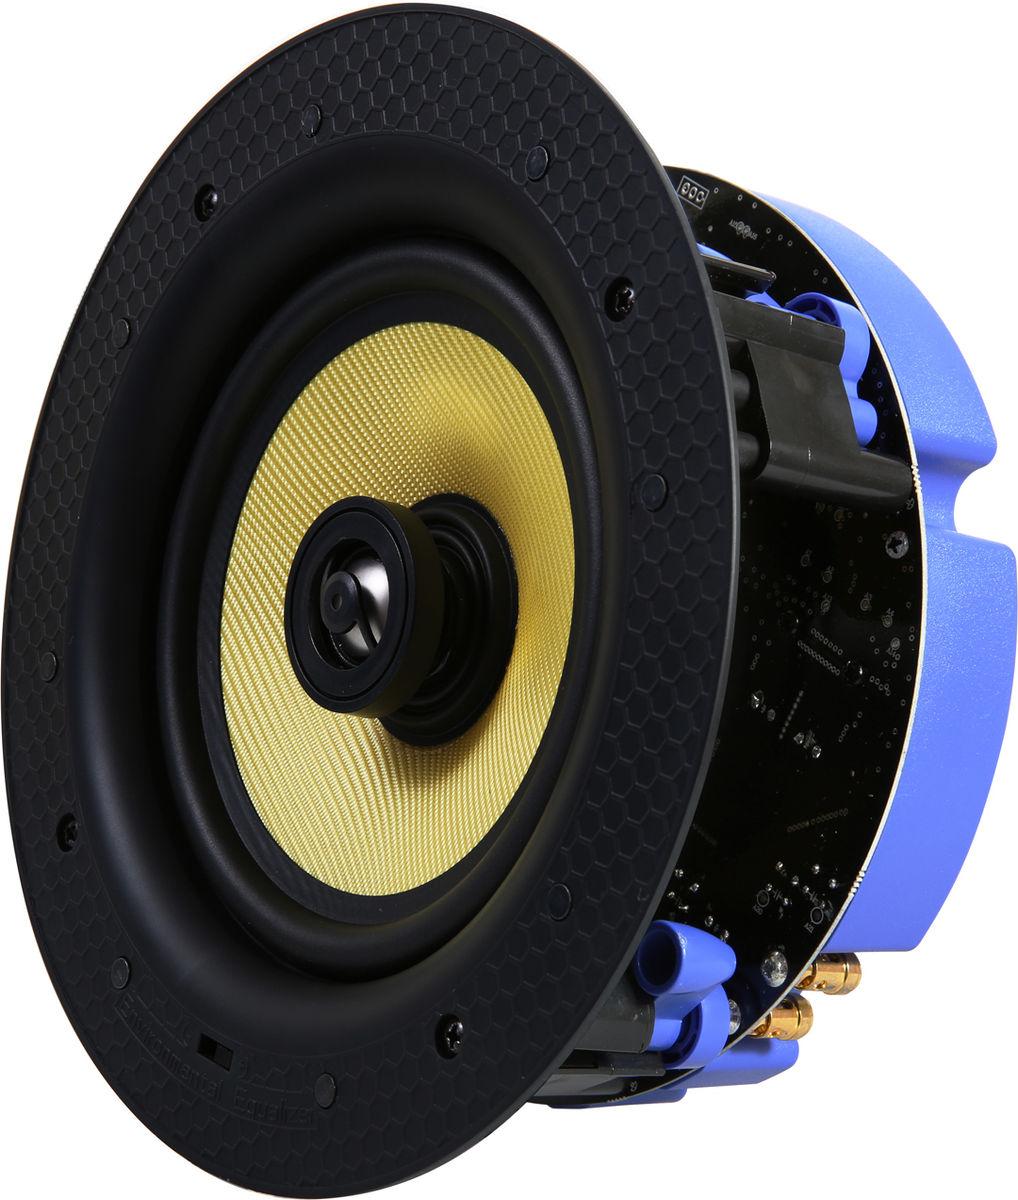 Enceintes Bluetooth encastrables Lithe Audio Bluetooth Ceiling Speaker (pin protect)